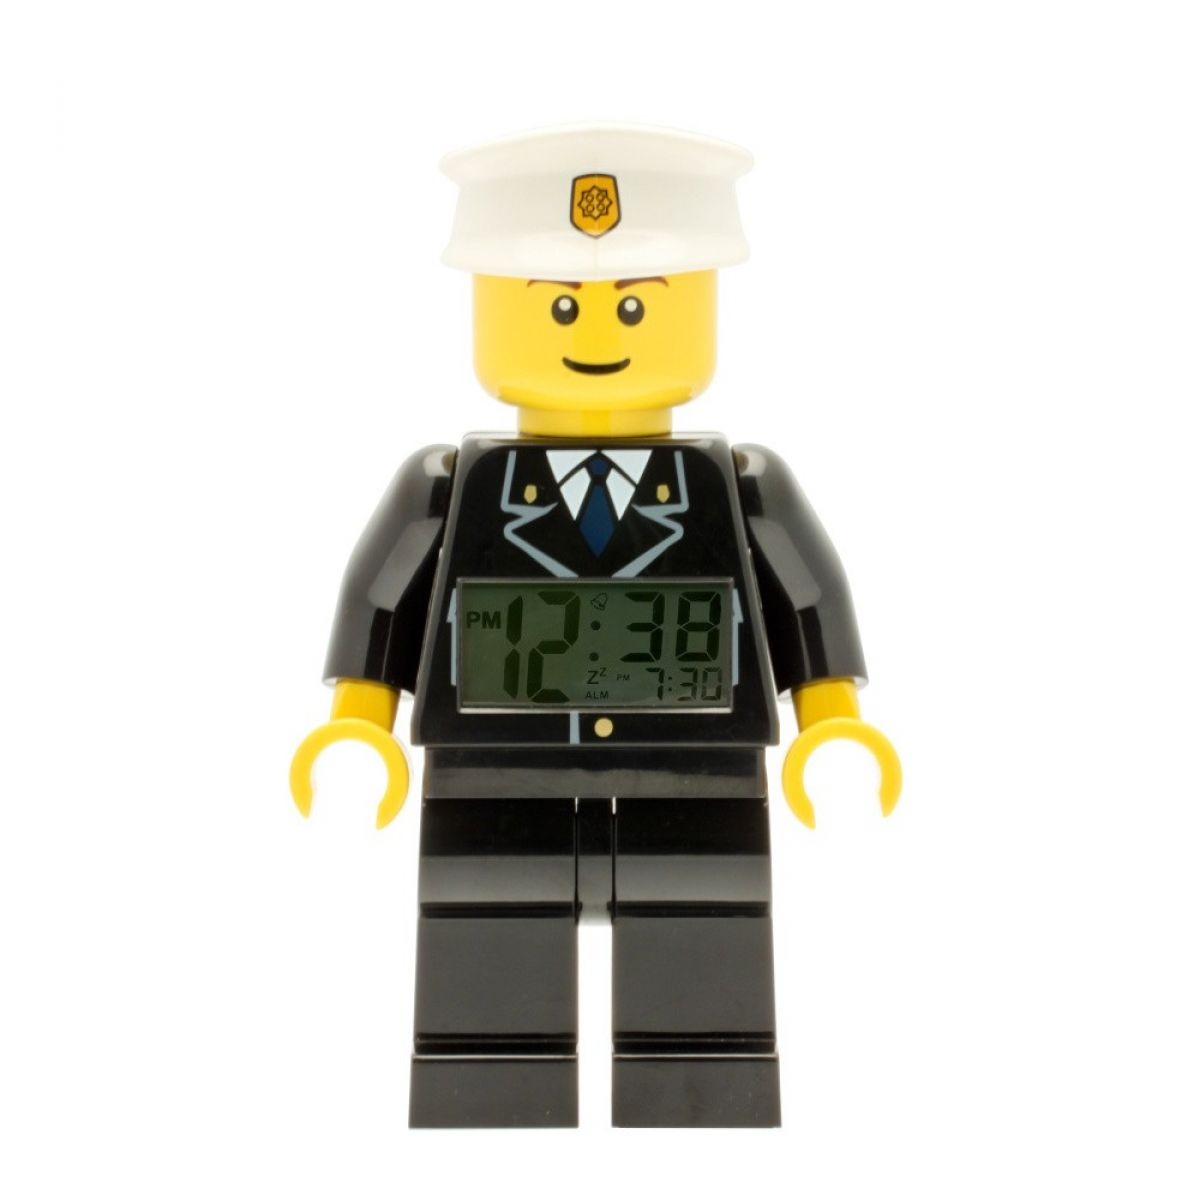 LEGO City Policeman hodiny s budíkem - Poškozený obal